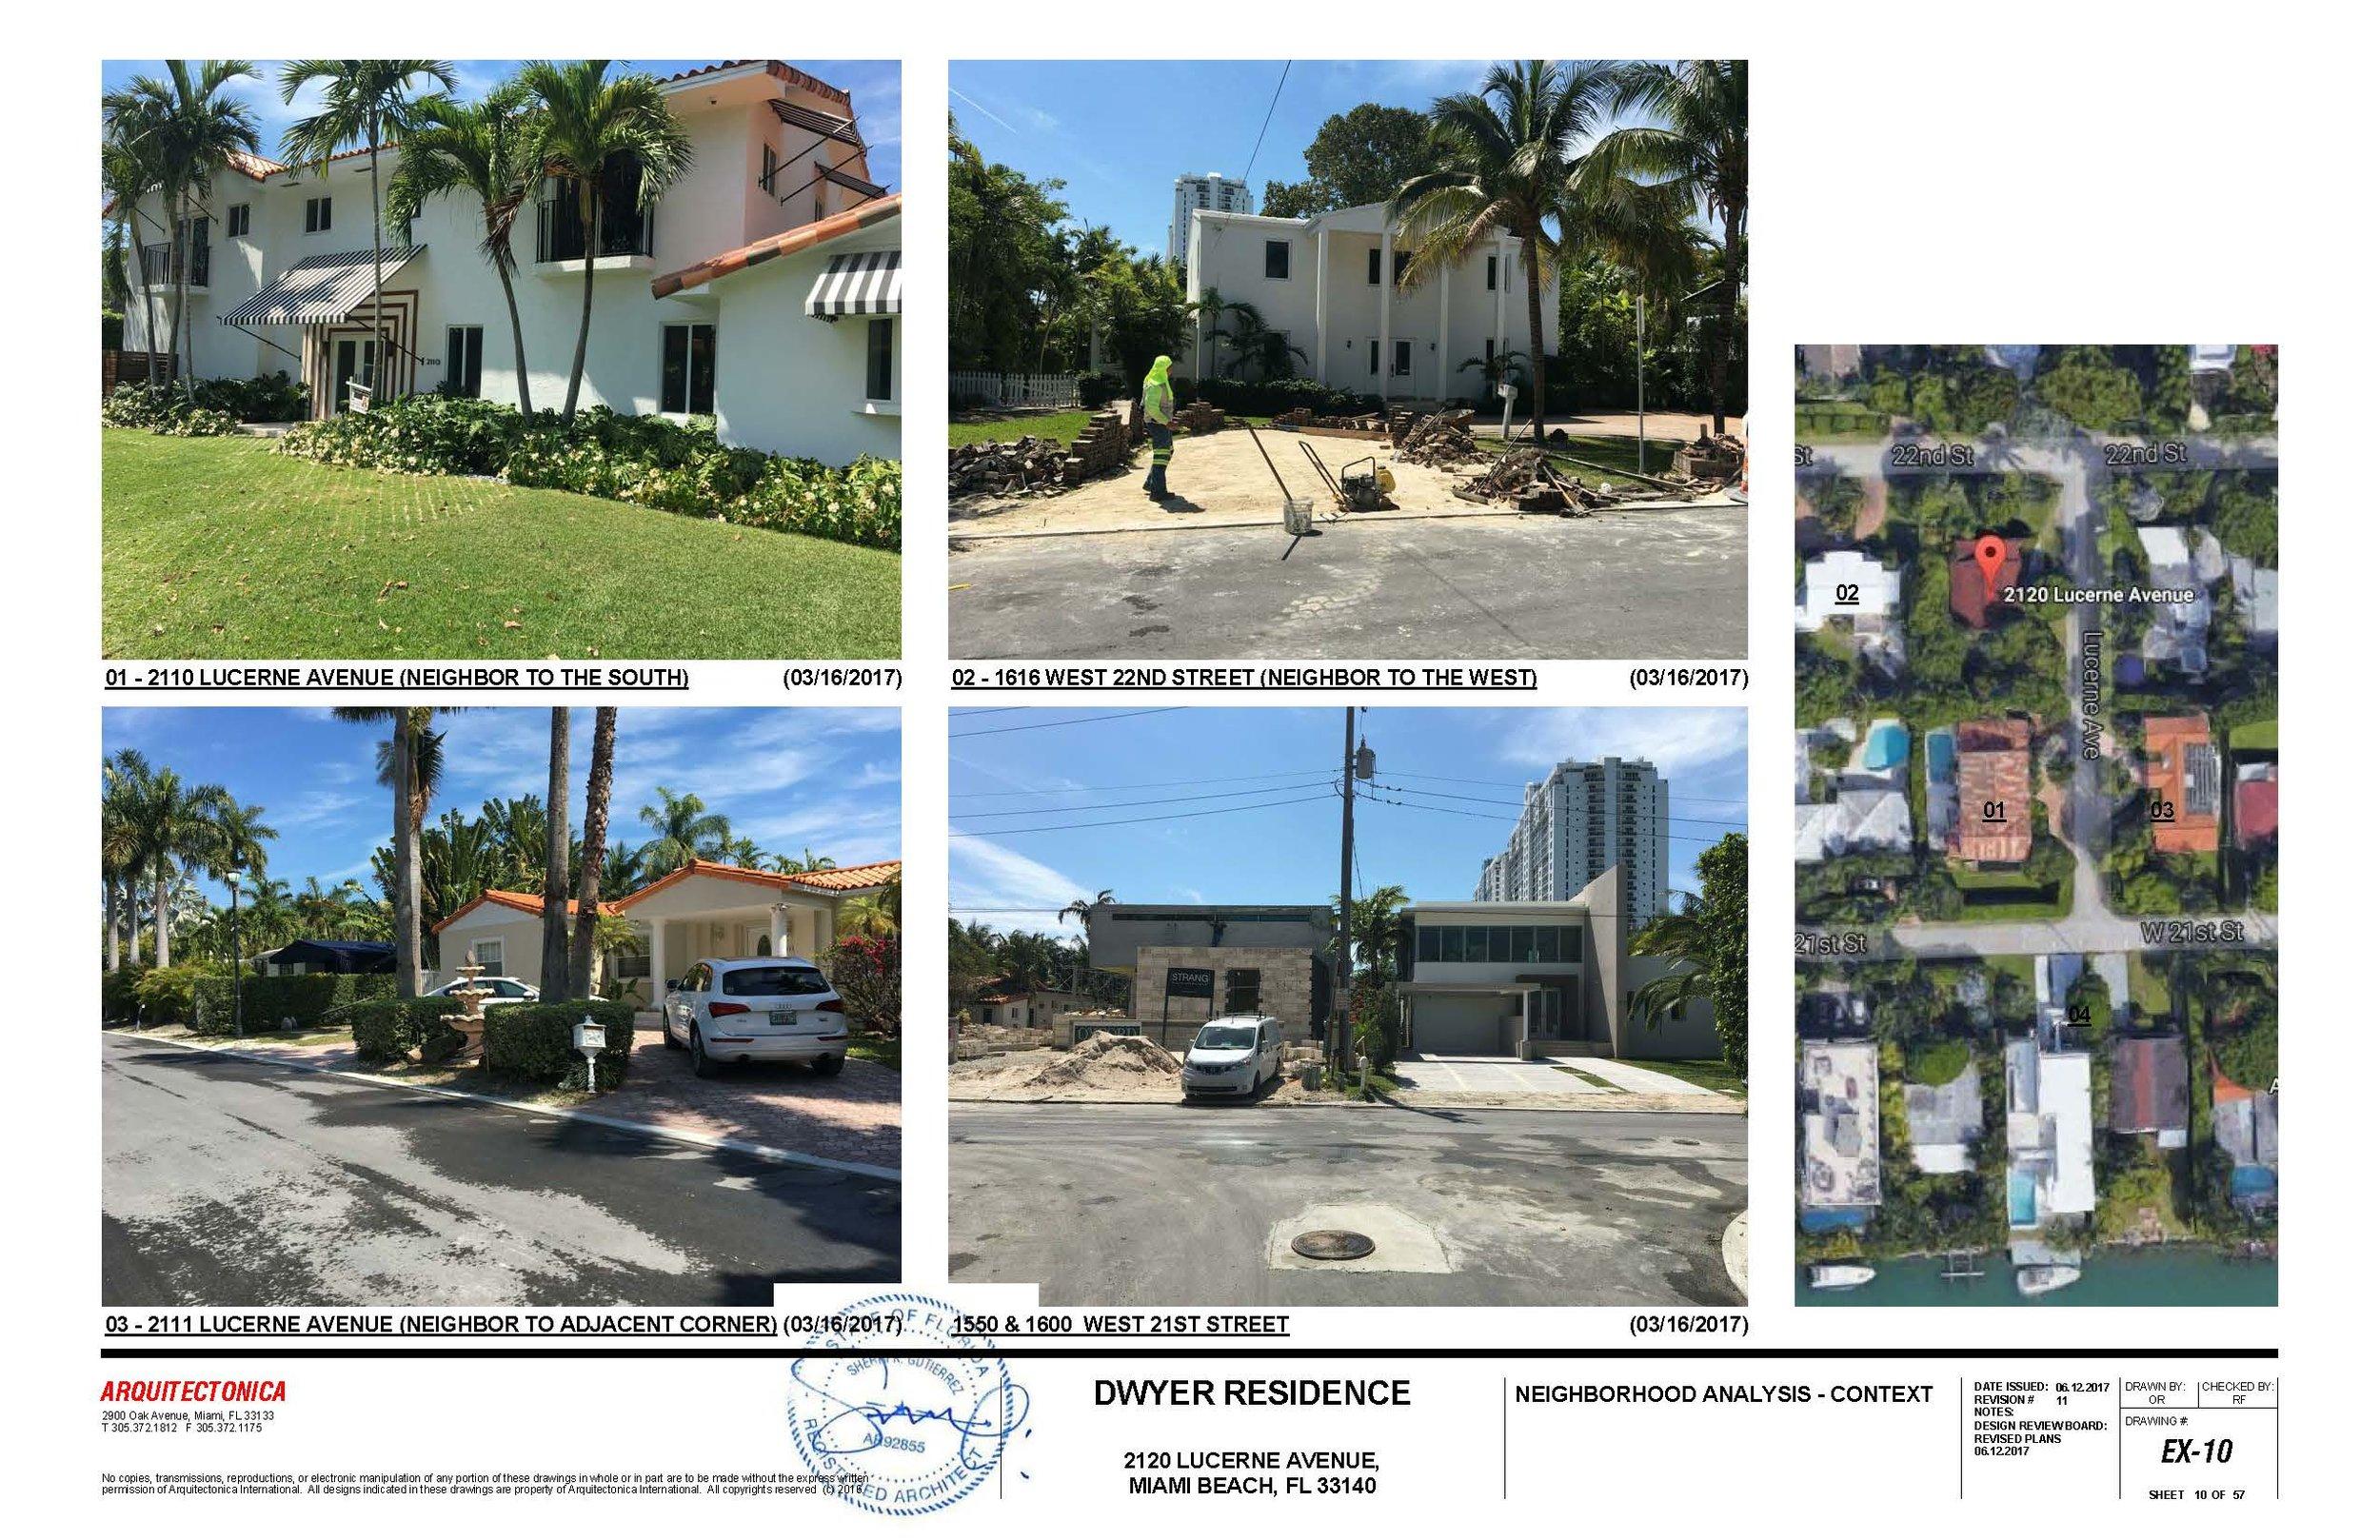 Dwyer Residence - 2120 Lucerne Avenue_Page_10.jpg